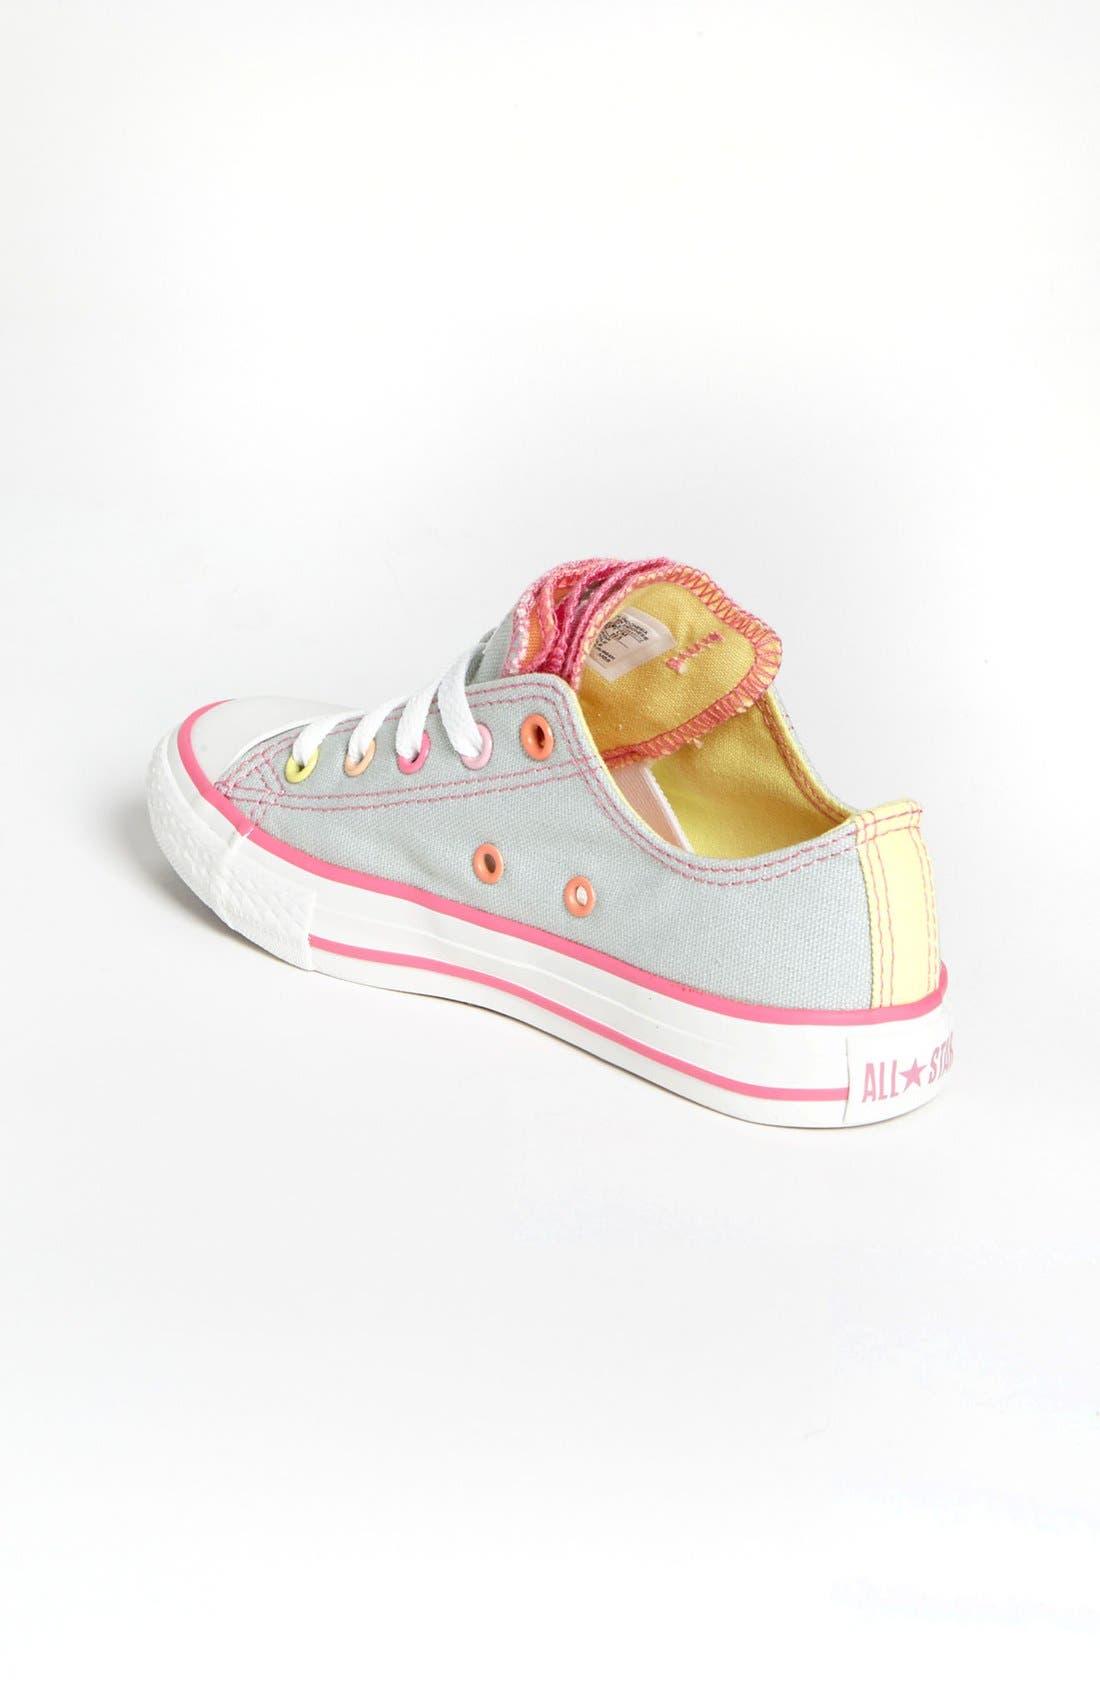 Alternate Image 2  - Converse All Star® Multi-Tongue Sneaker (Toddler, Little Kid & Big Kid)